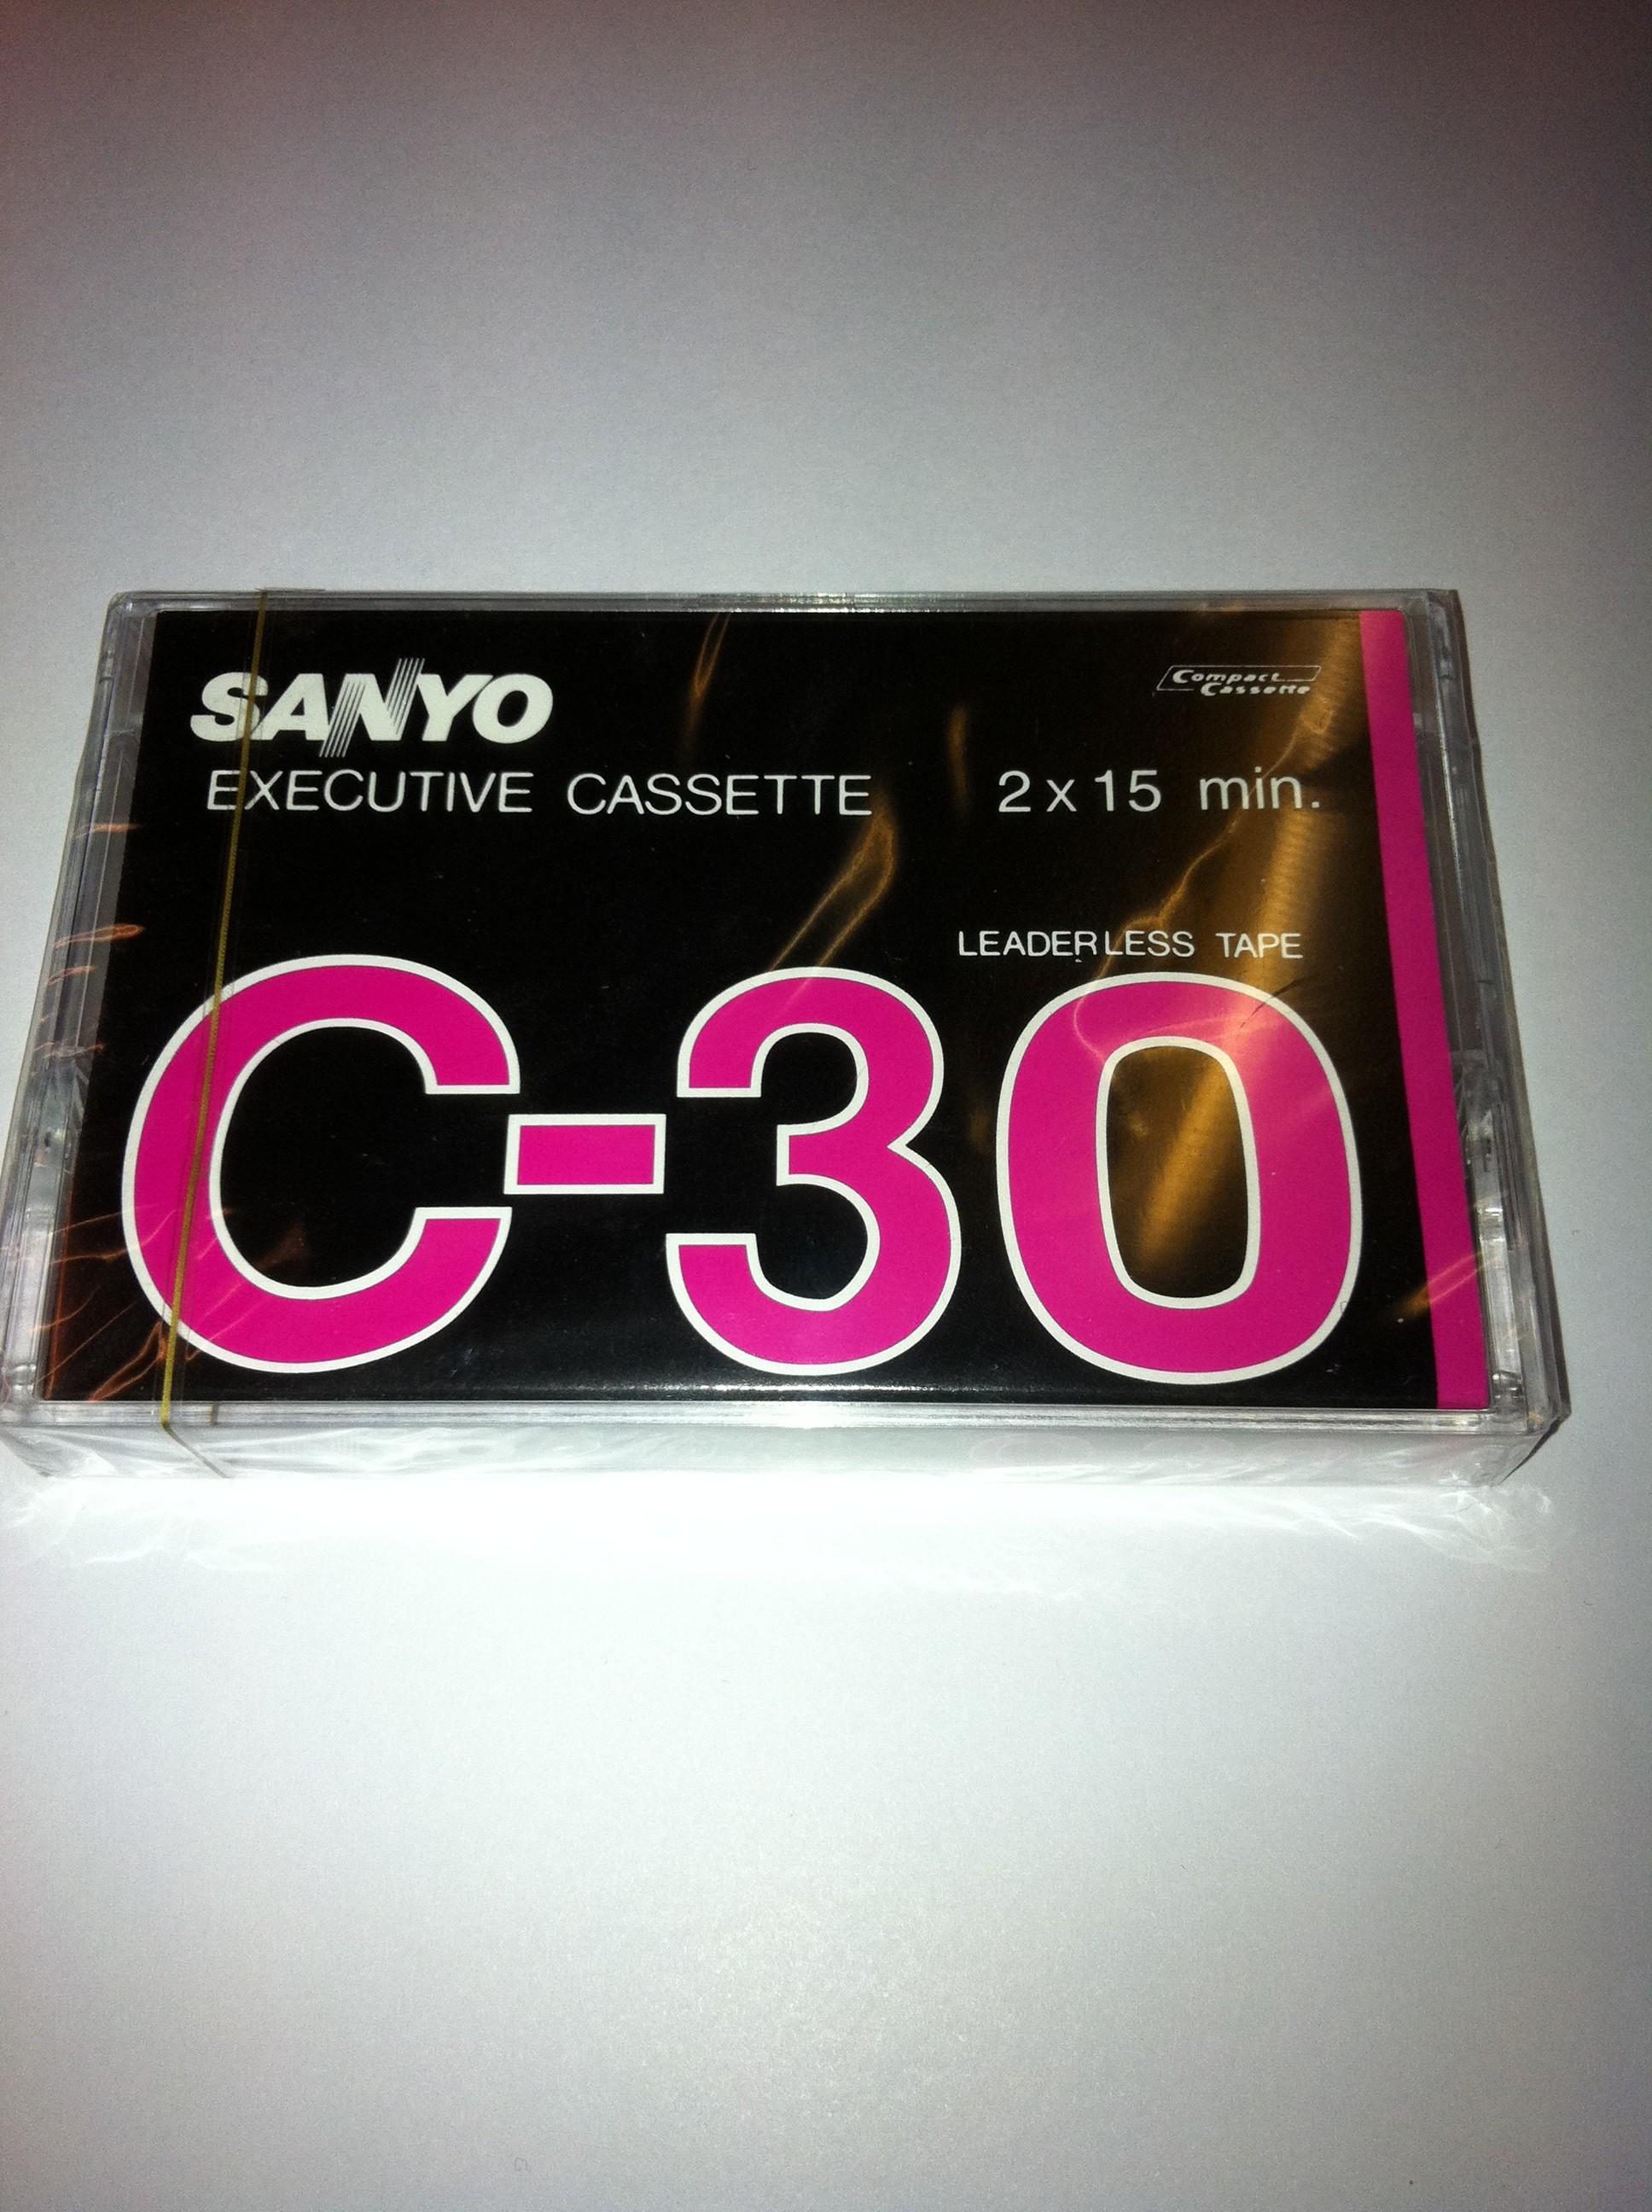 Sanyo C-30 Executive cassette 2 x 15 minutter